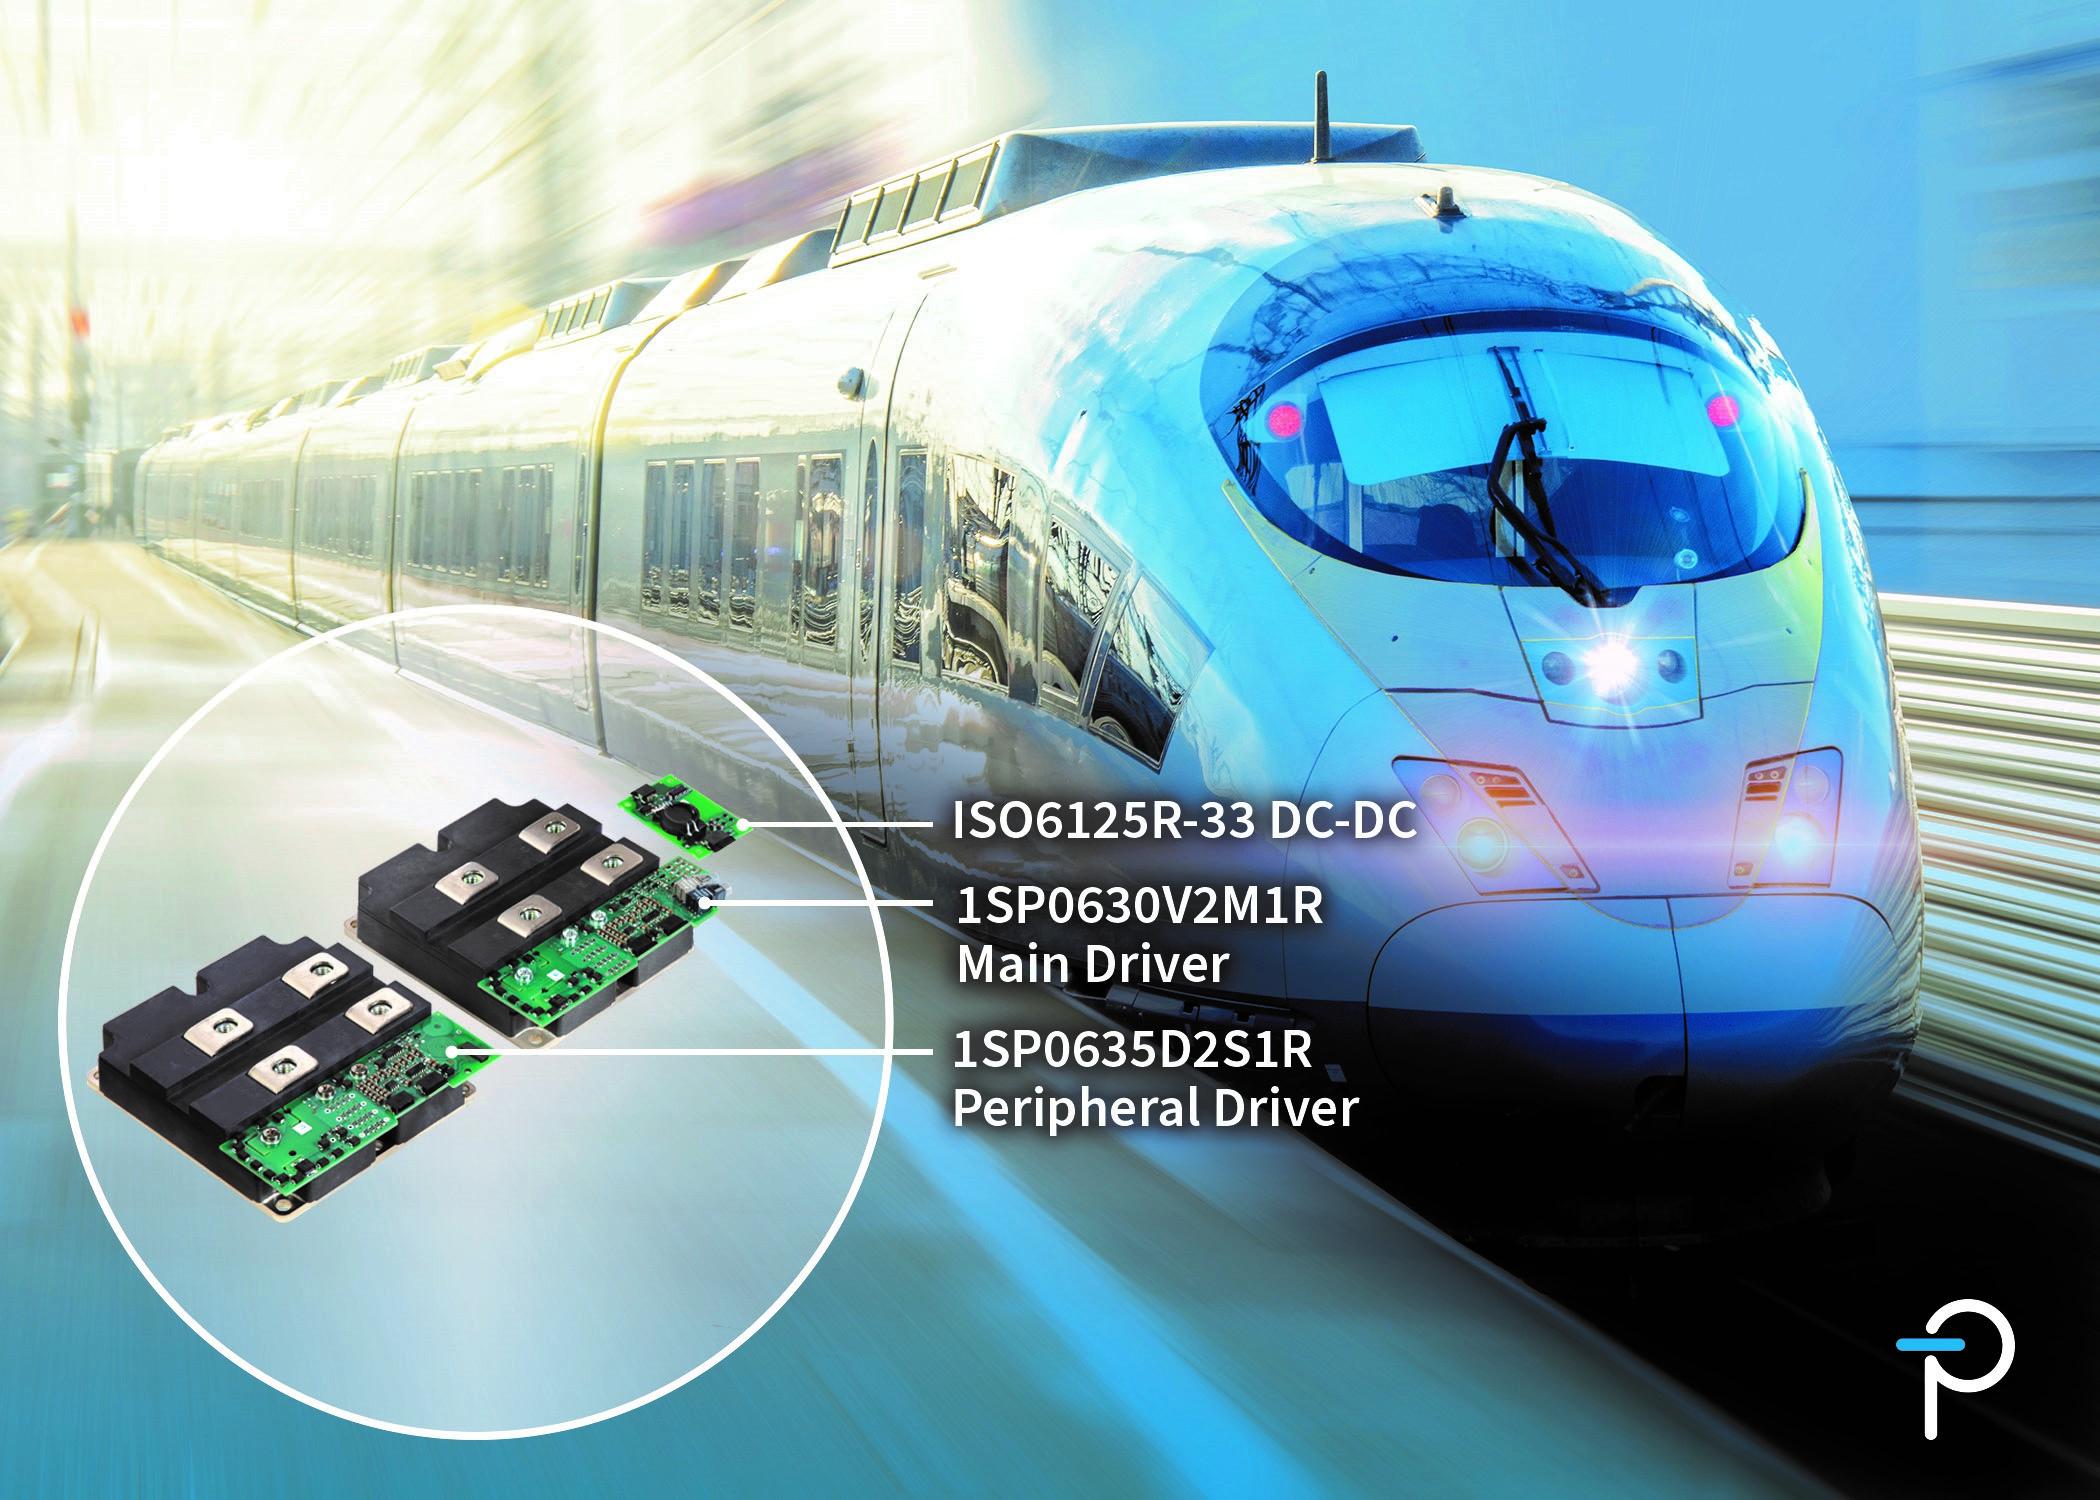 Power Integrations面向轨道交通应用推出新款外形紧凑、坚固耐用的SCALE-2即插即用型门极驱动